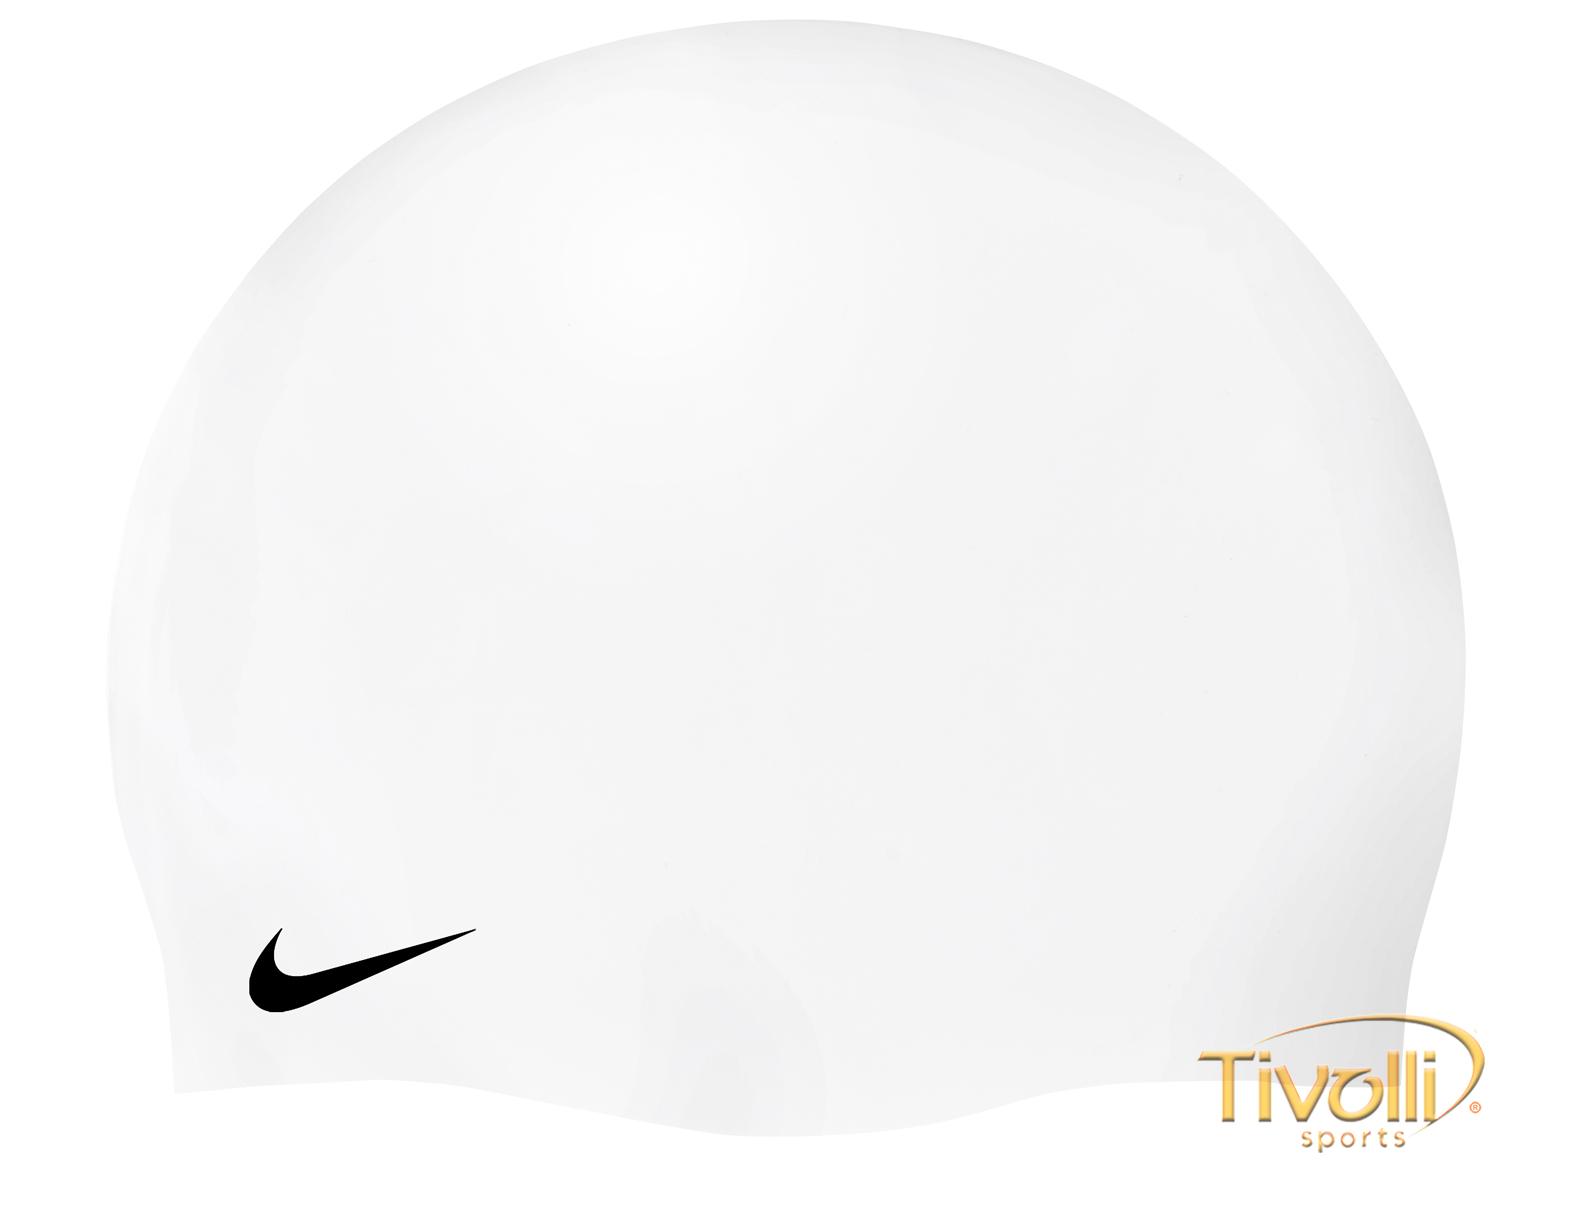 672ff034d2139 Touca de Natação Nike Solid Silicone Cap   Unissex Branca